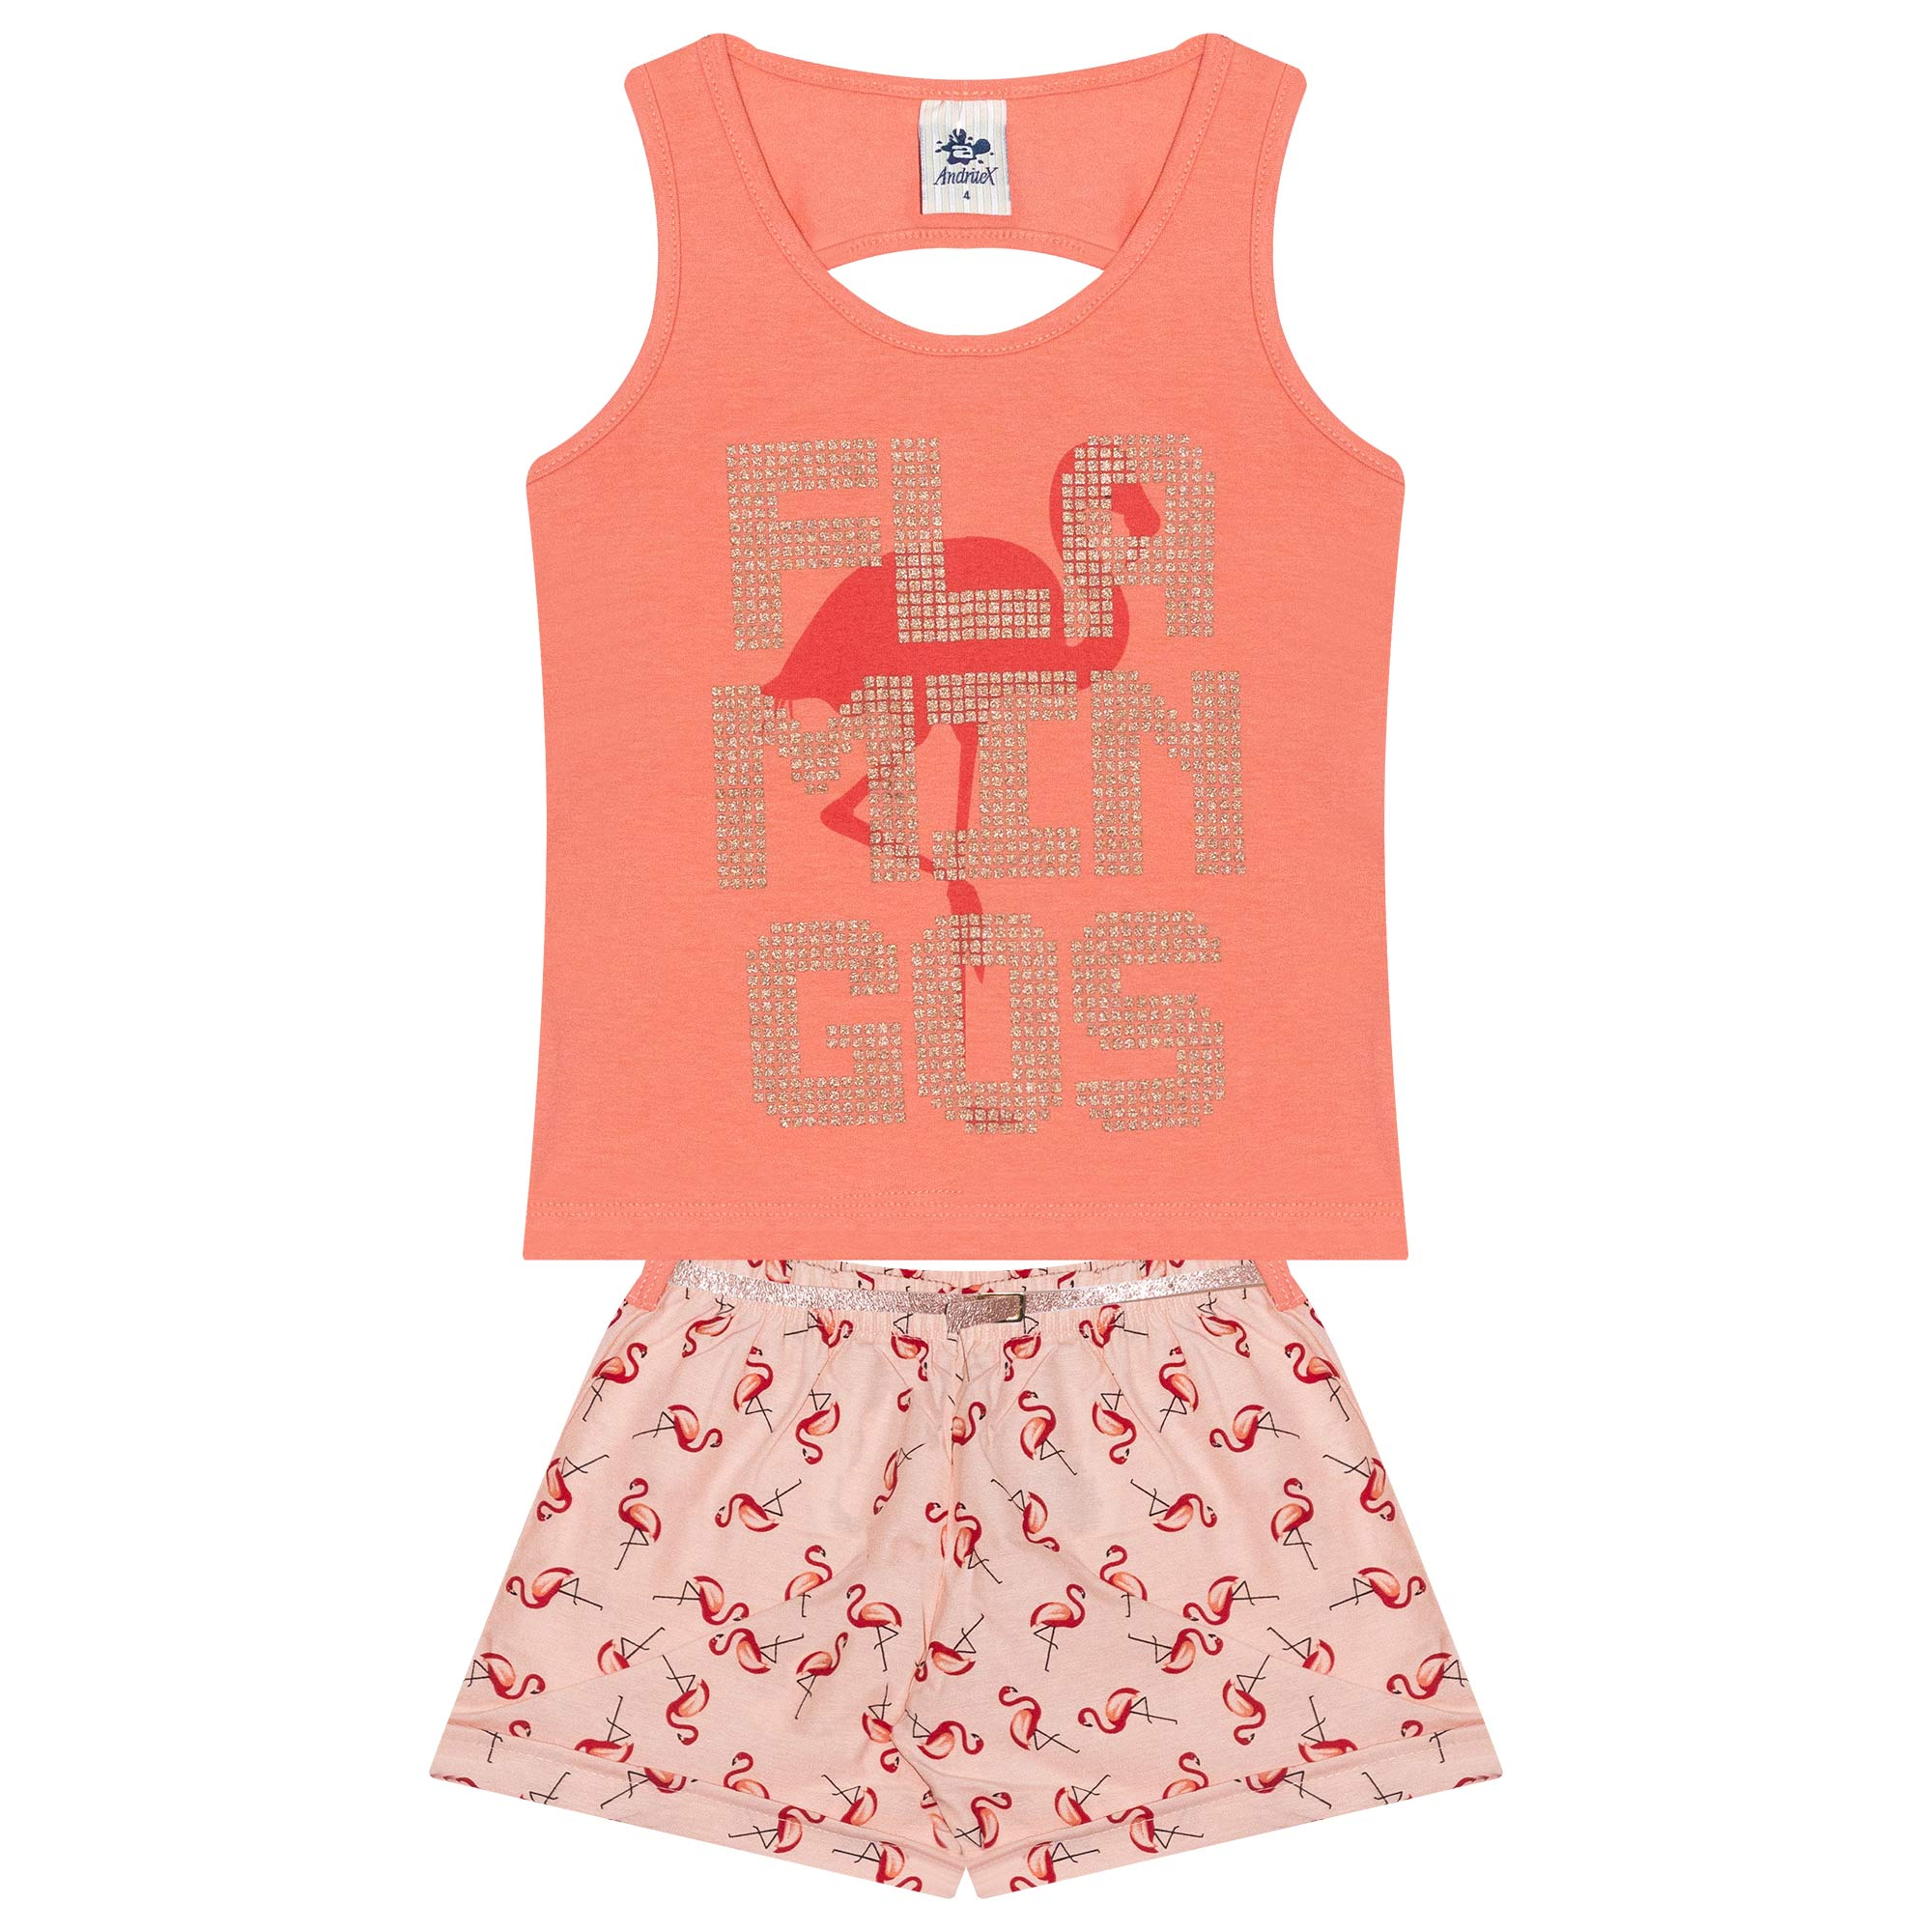 Conjunto Infantil Regata Feminino Flamingo - Ref 4878 - Salmão - Andritex